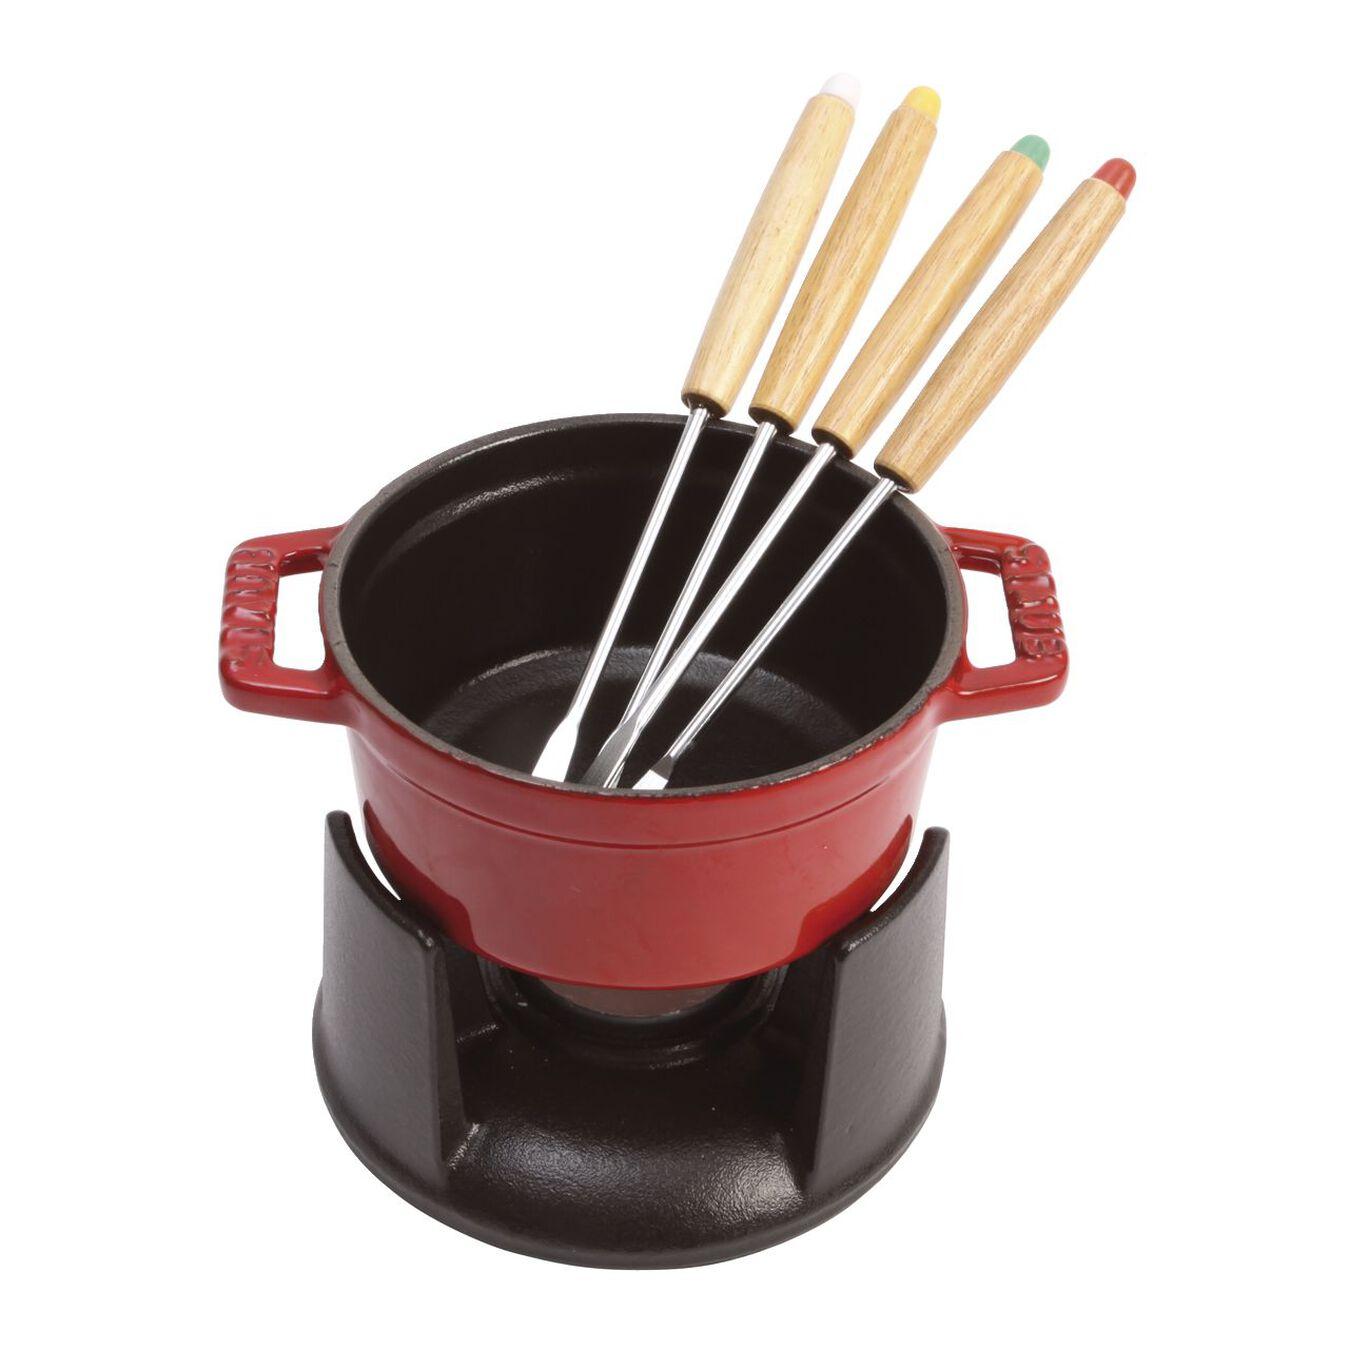 Service à fondue 10 cm, Cerise, Fonte,,large 4